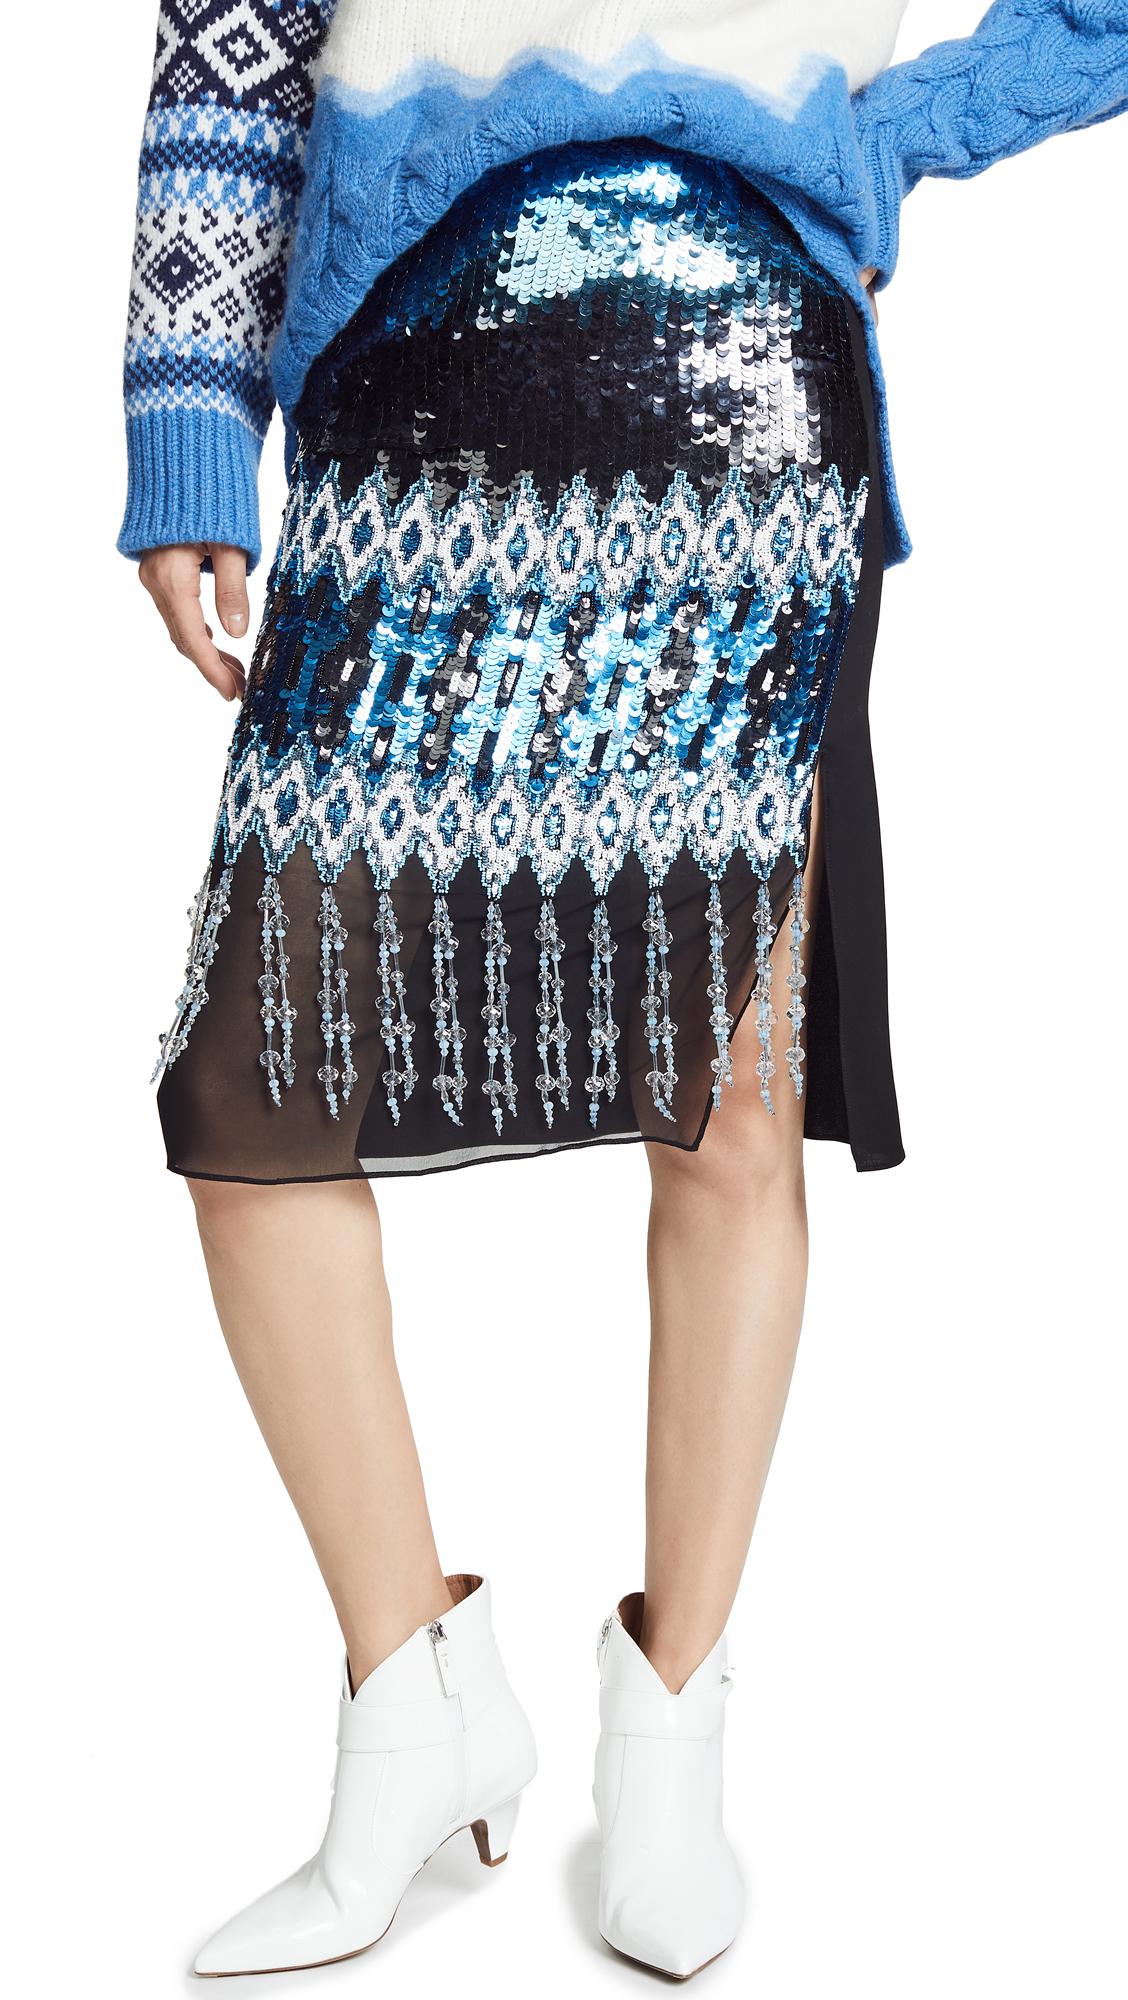 Prabal Gurung Kyla Ikat Embroidered Pencil Skirt In Navy Multi